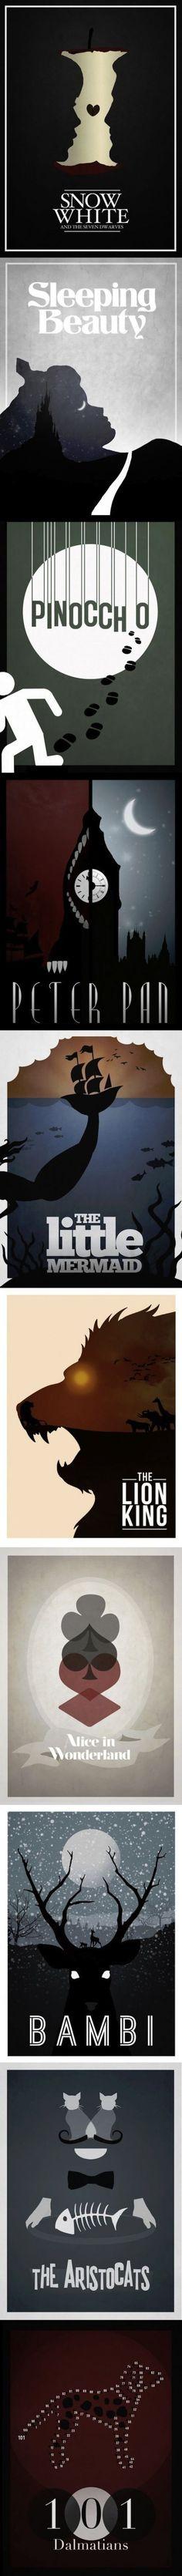 Simplistic Disney film posters.